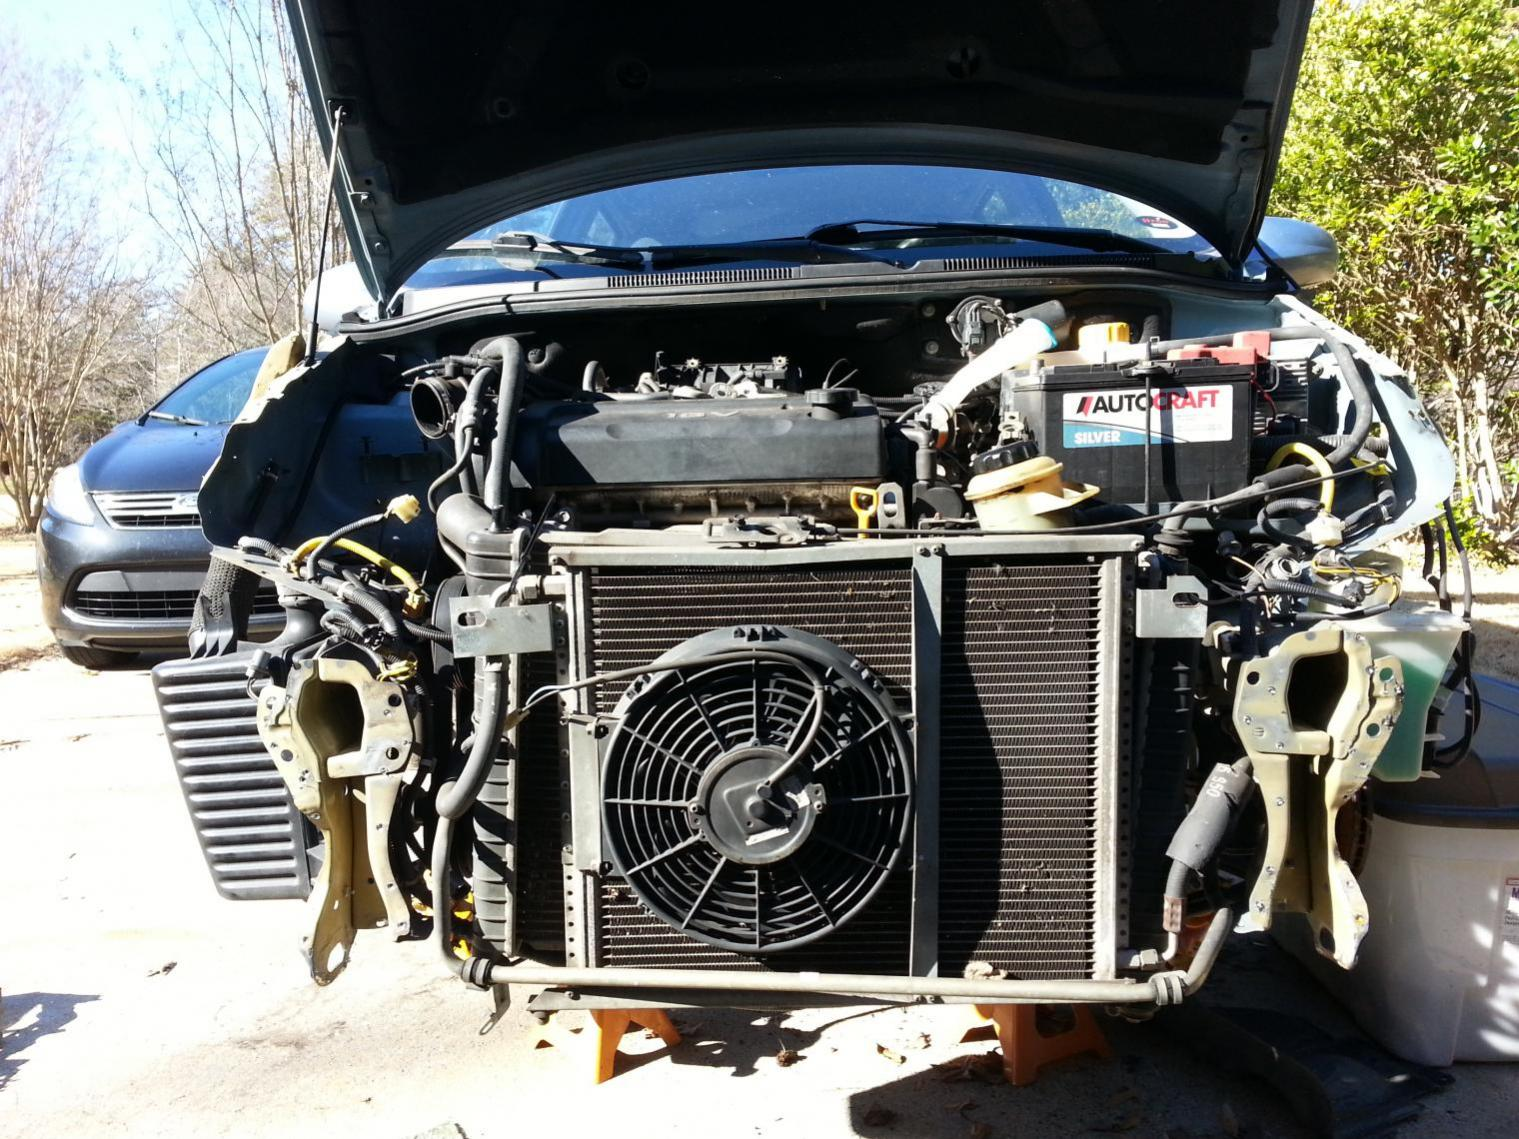 Troubleshooting Radiator Fan